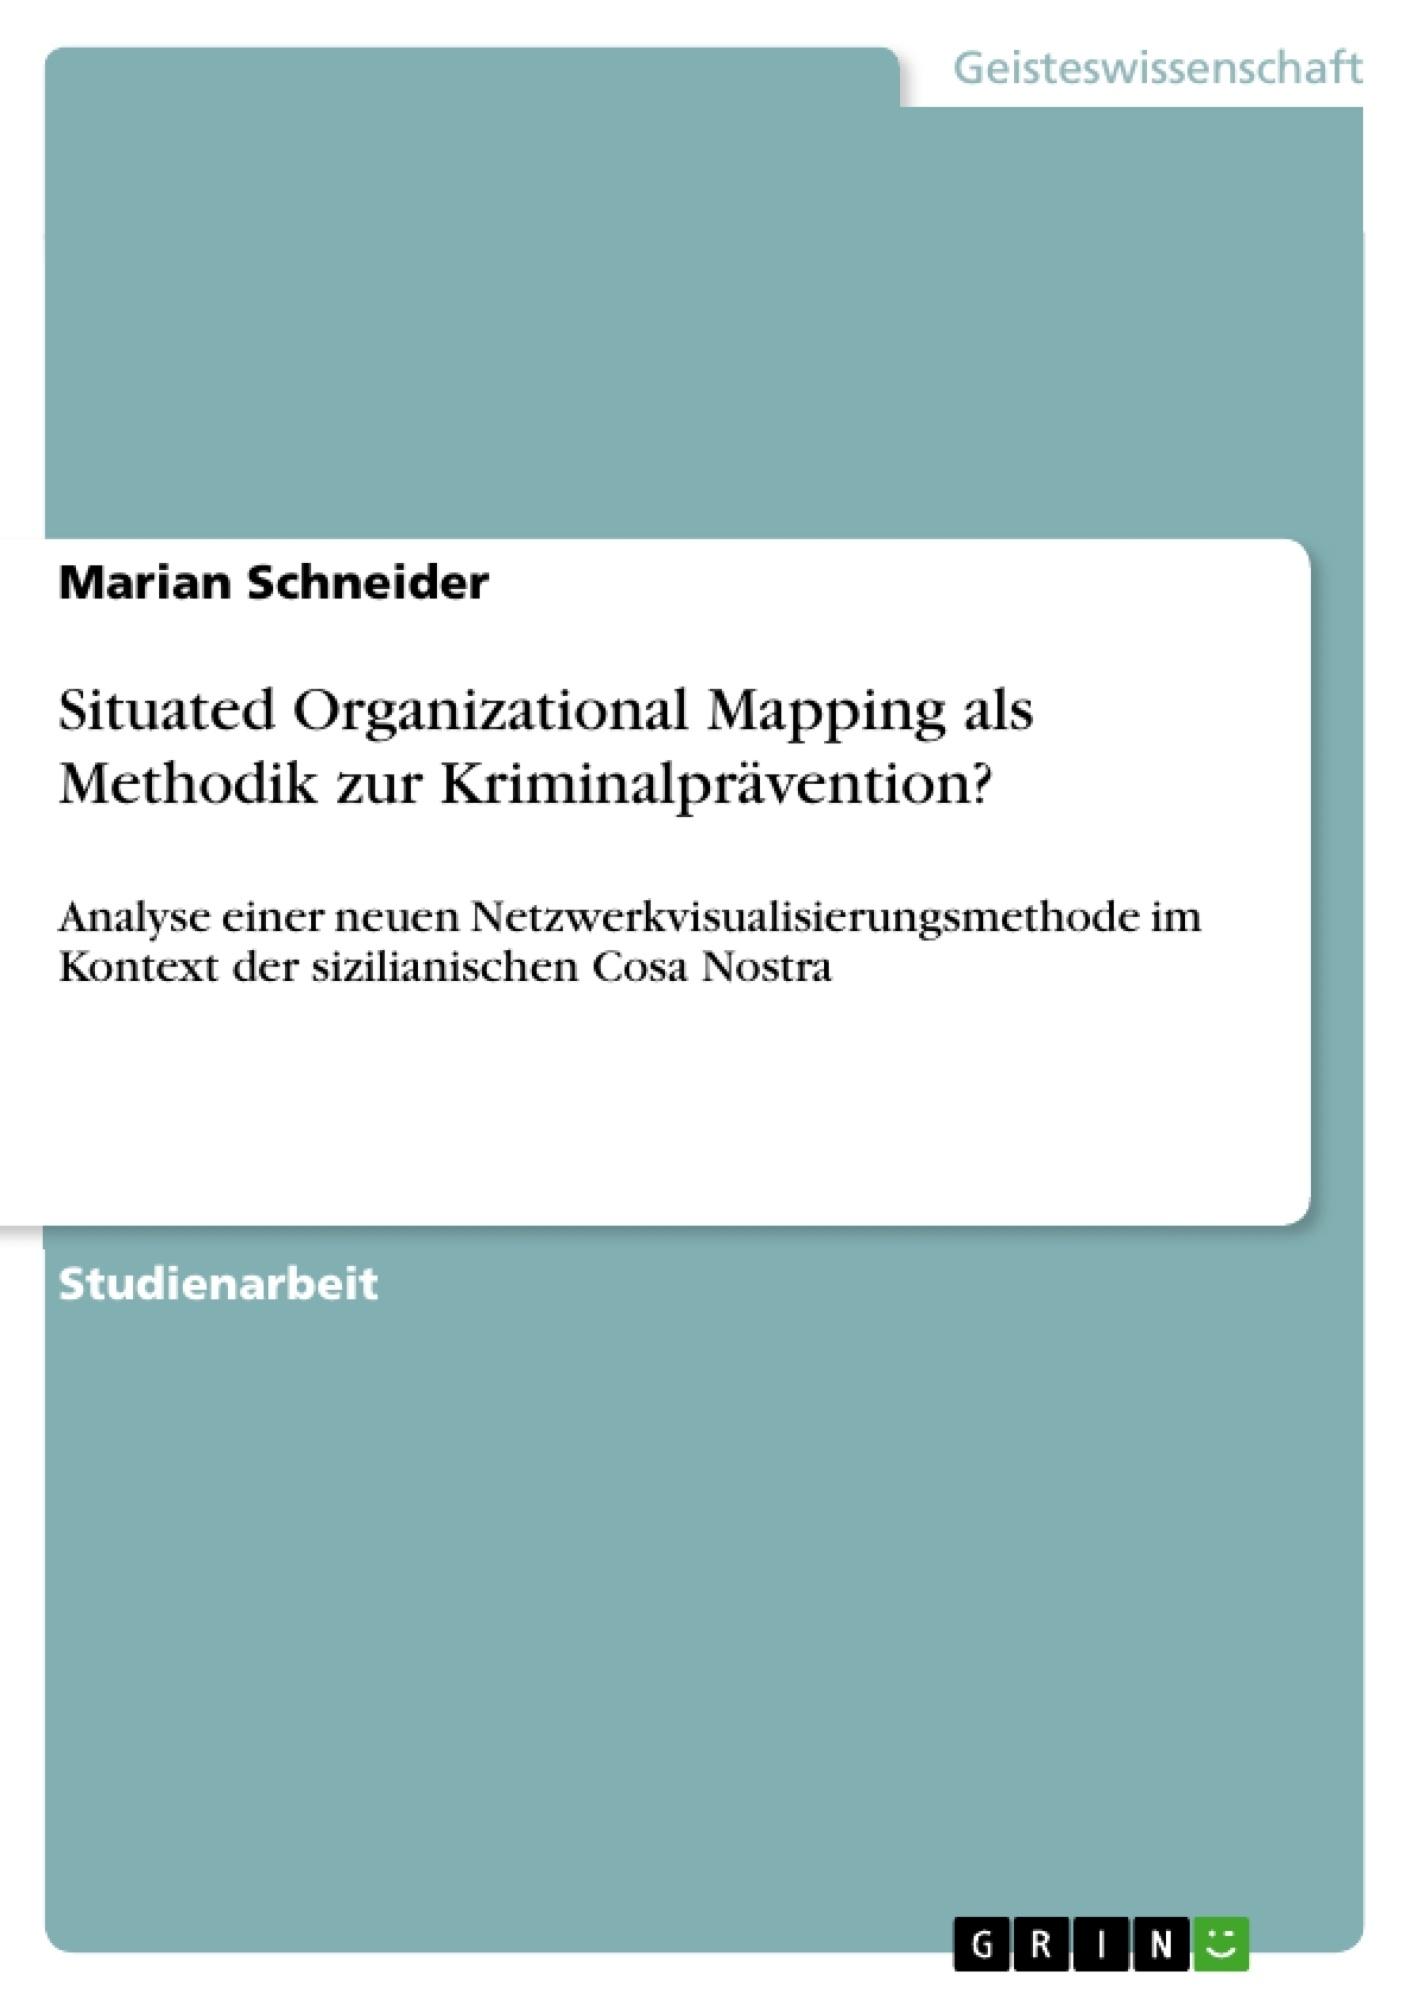 Titel: Situated Organizational Mapping als Methodik zur Kriminalprävention?